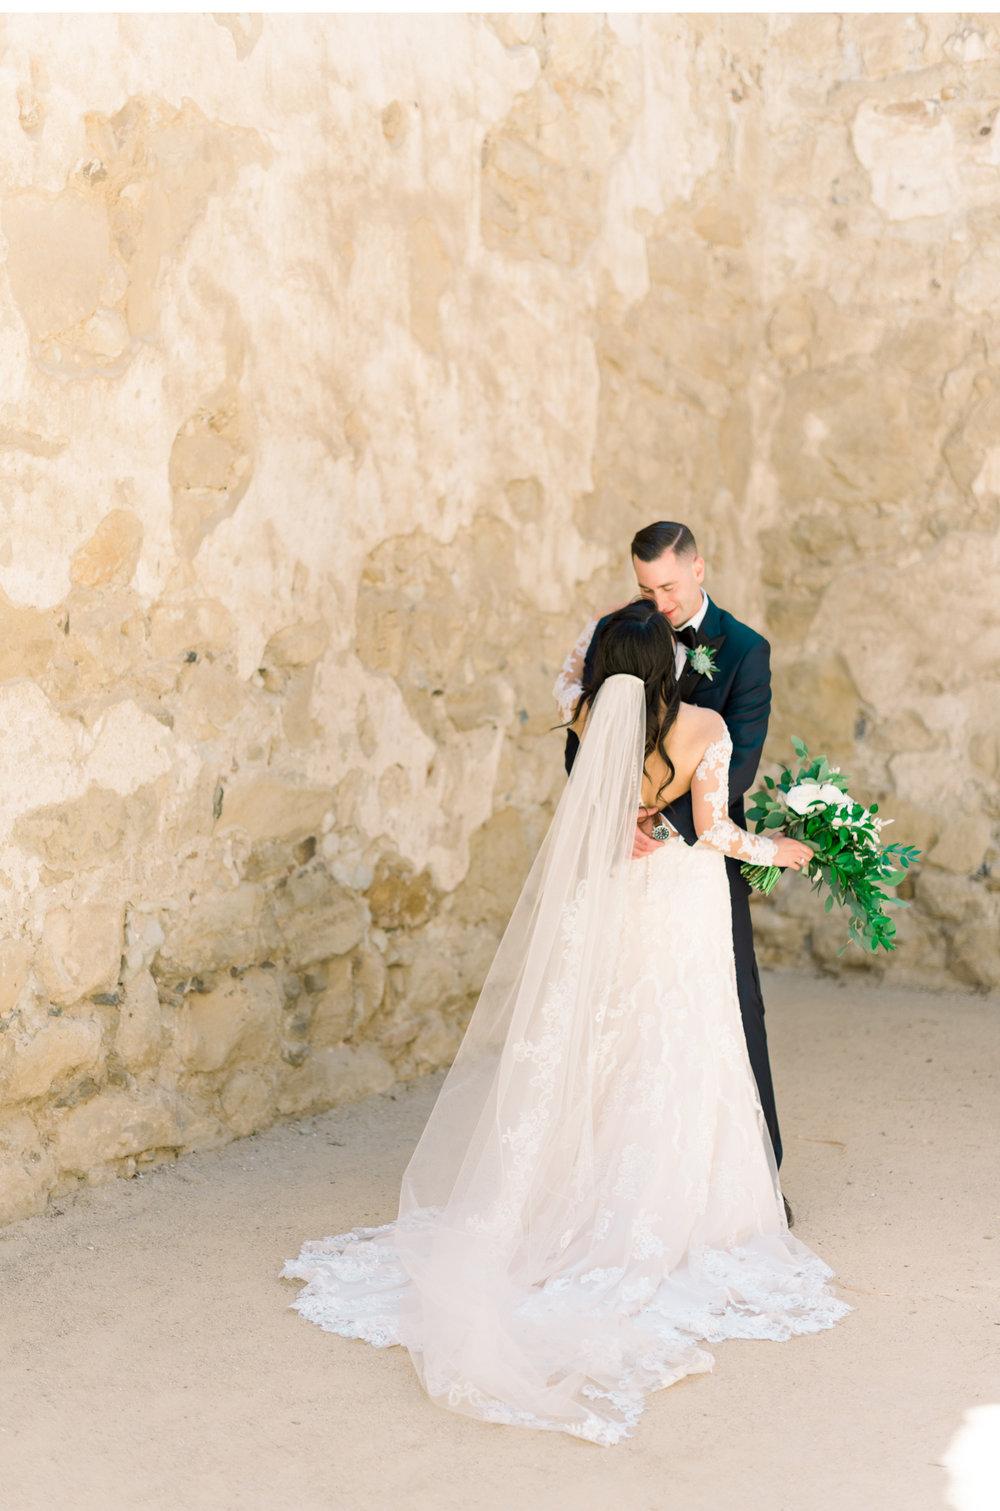 Southern-California-Weddings-Natalie-Schutt-Photography-Weddings_05.jpg